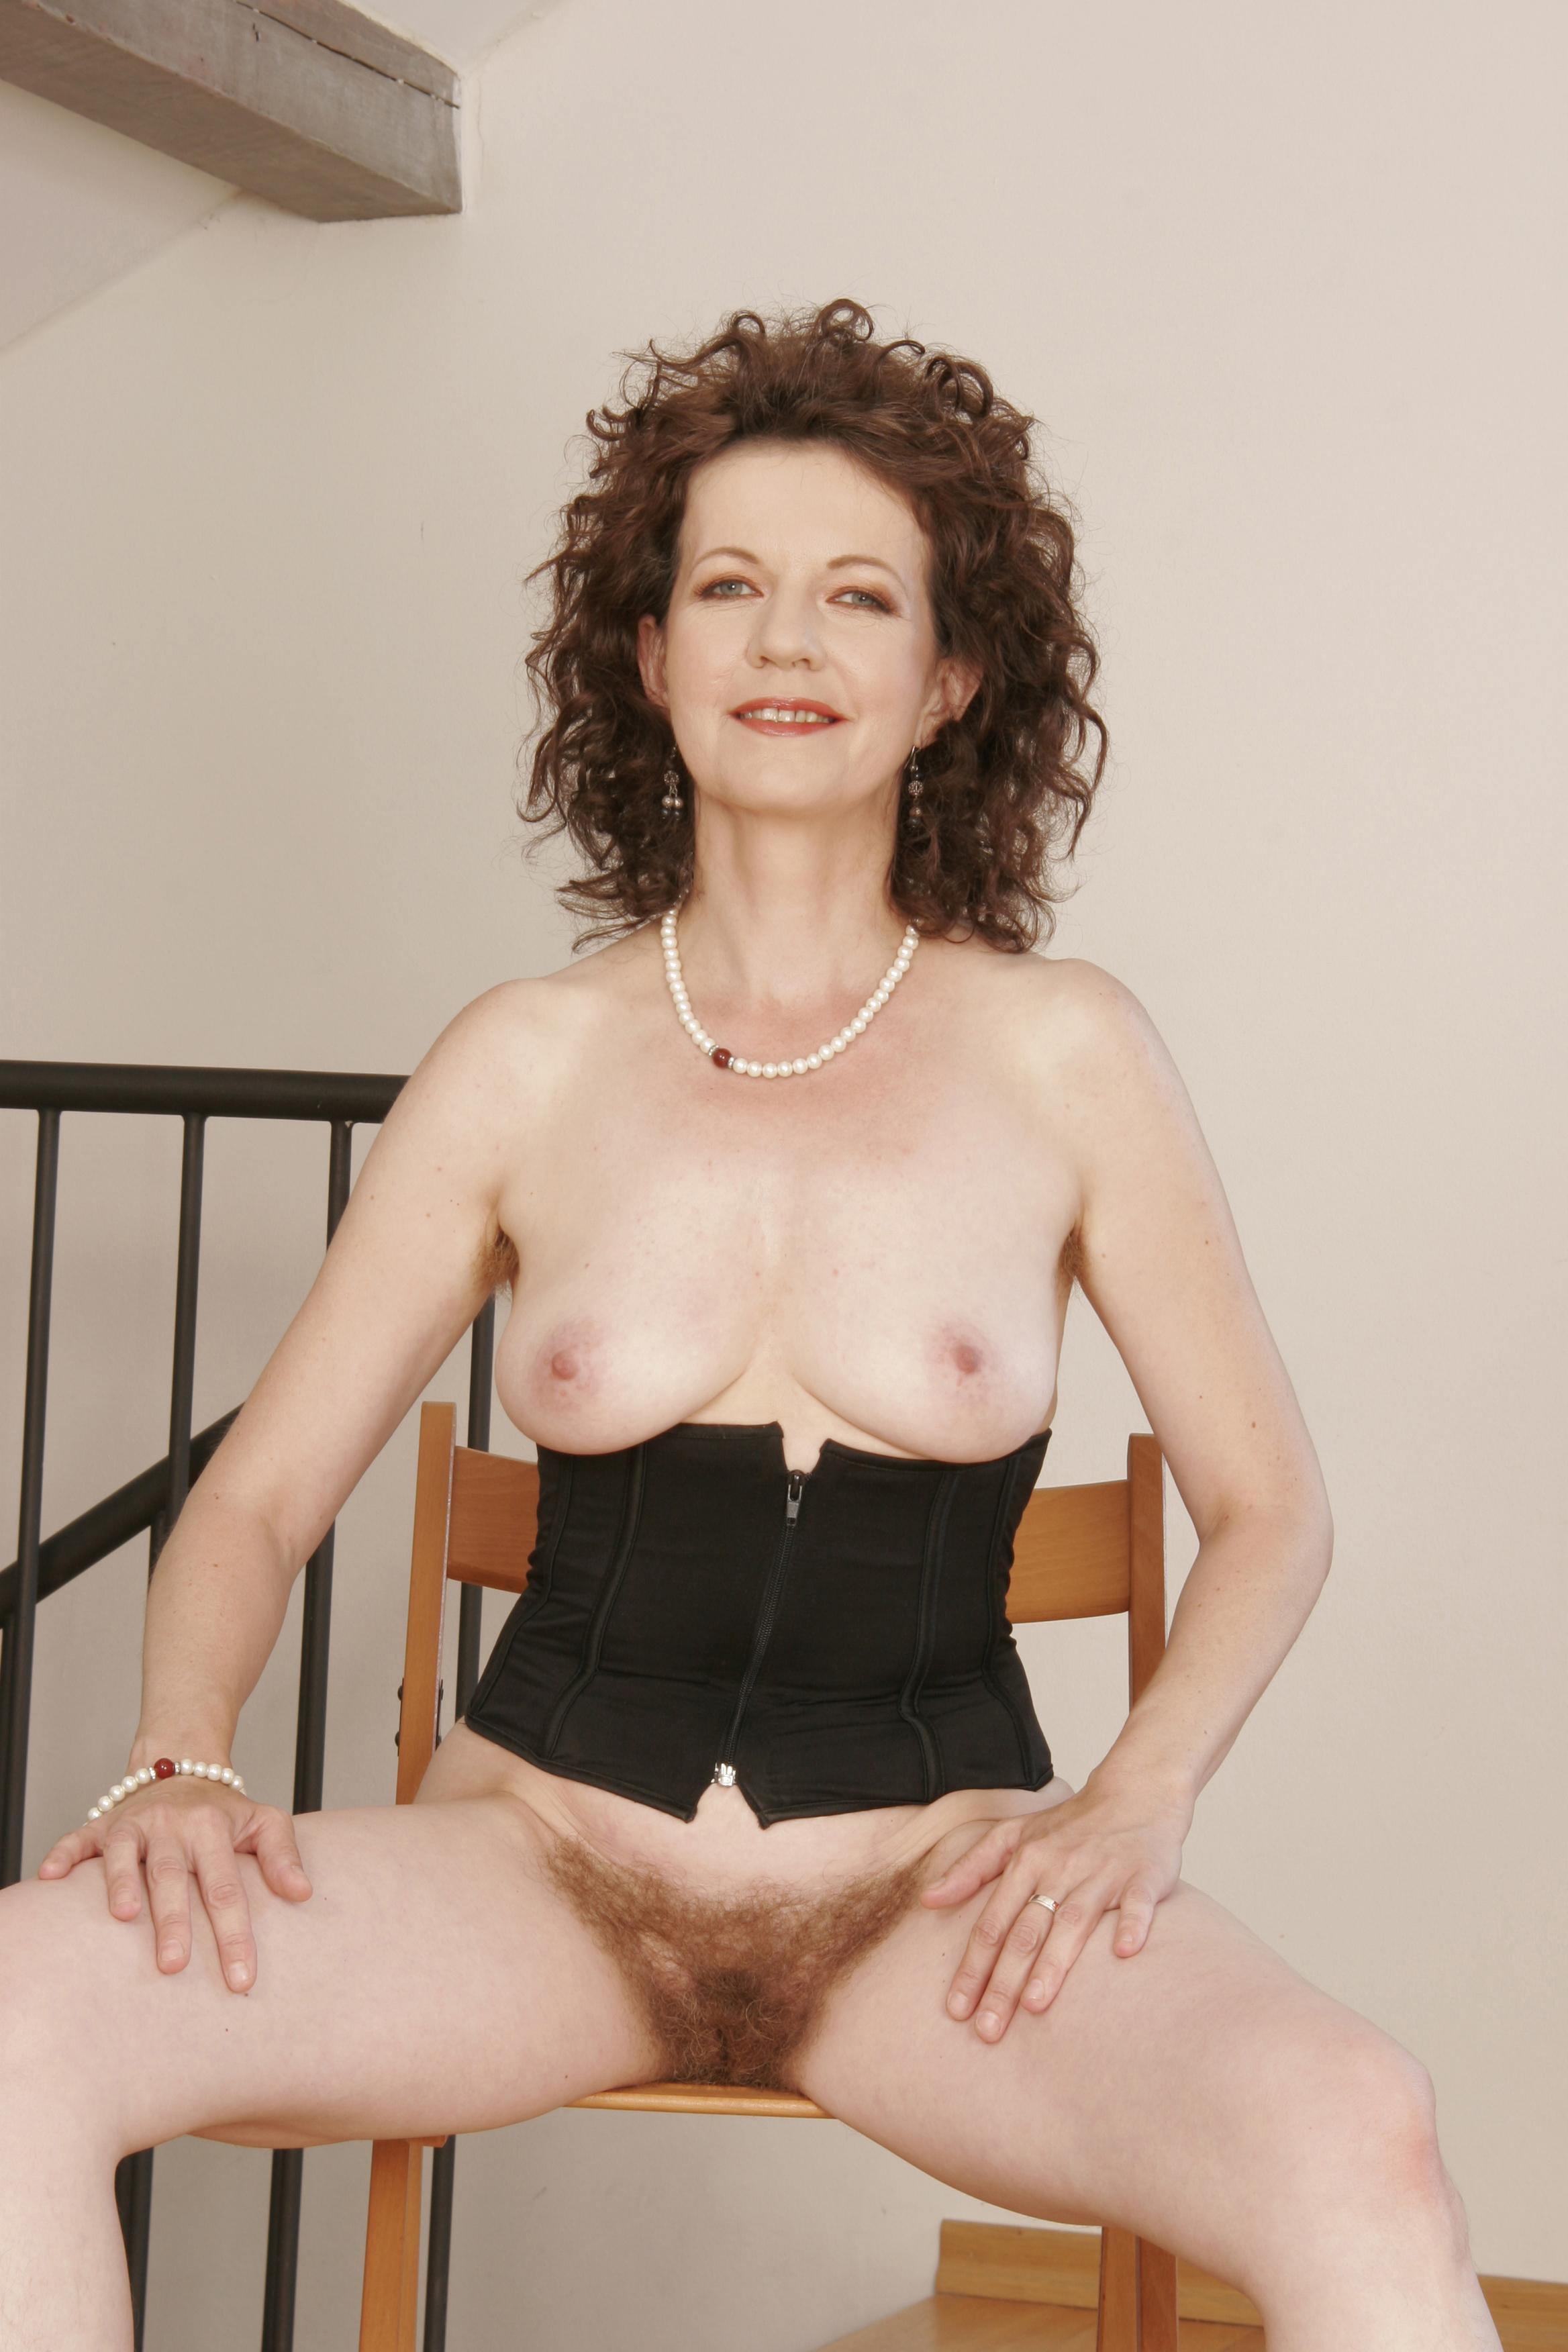 Milf wife big boobs free pics